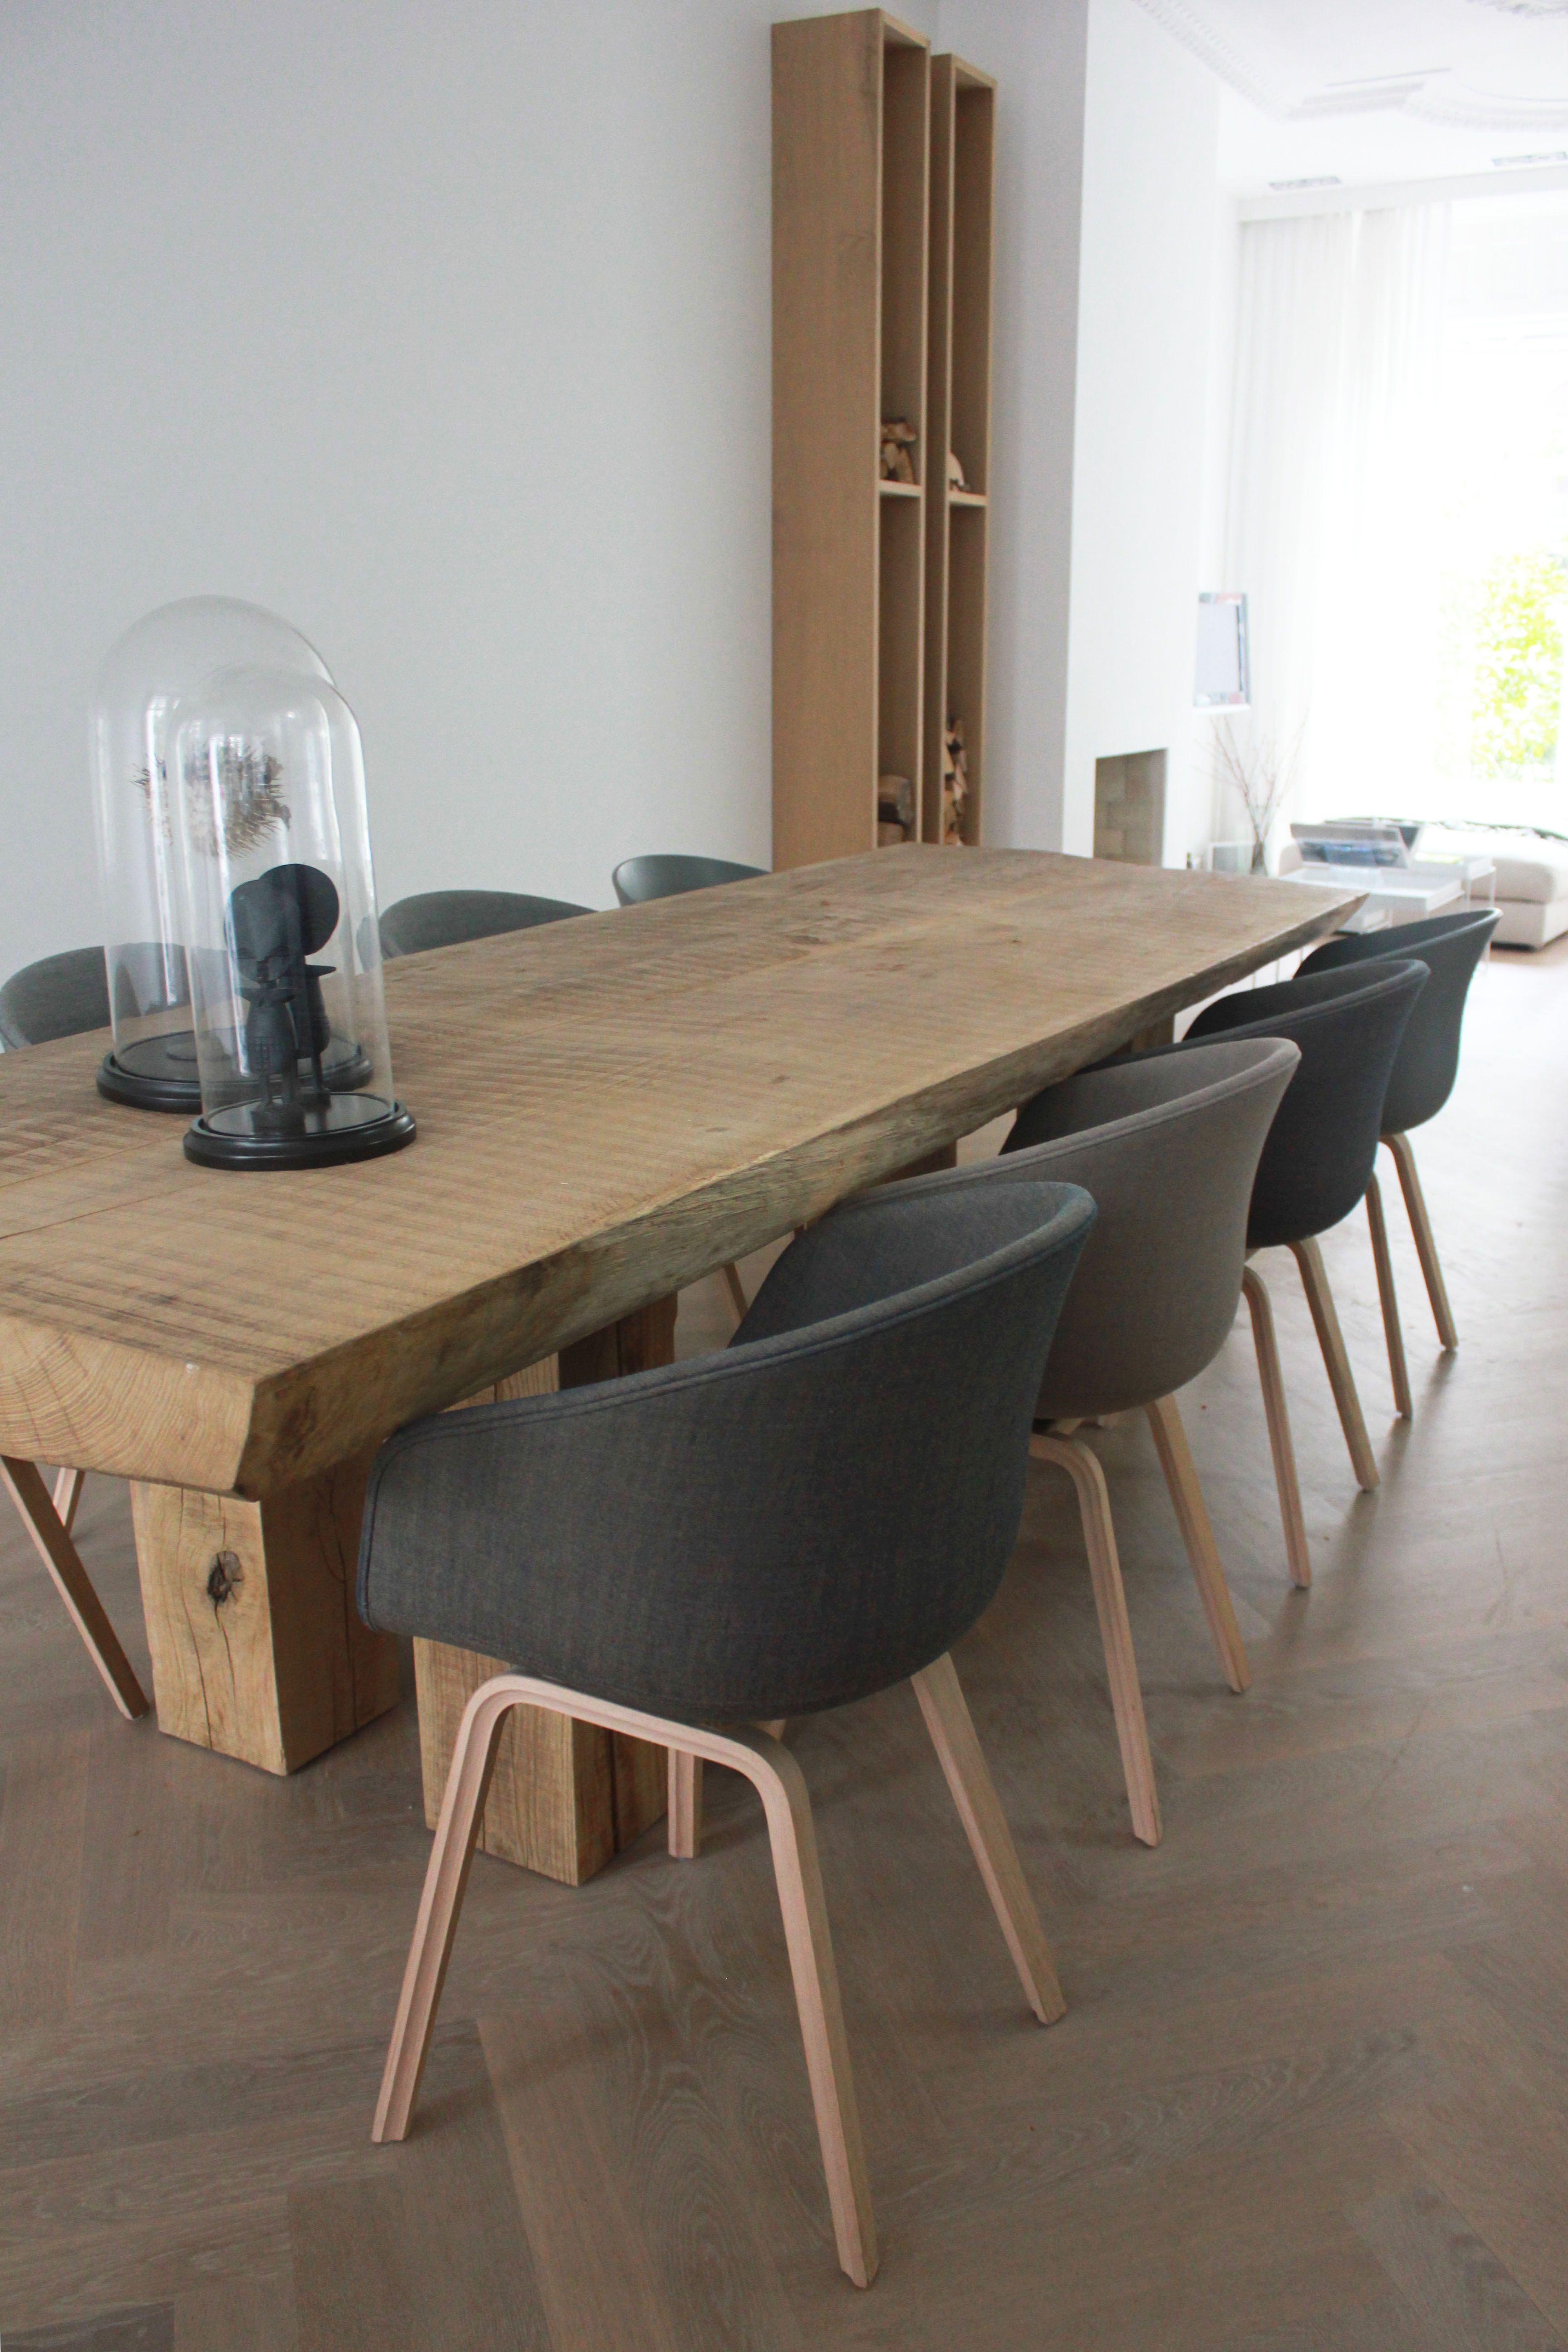 Eettafel Stoelen Modern.Modern Bathroom Design Eettafel Stoelen Eetkamerstoelen En Huis